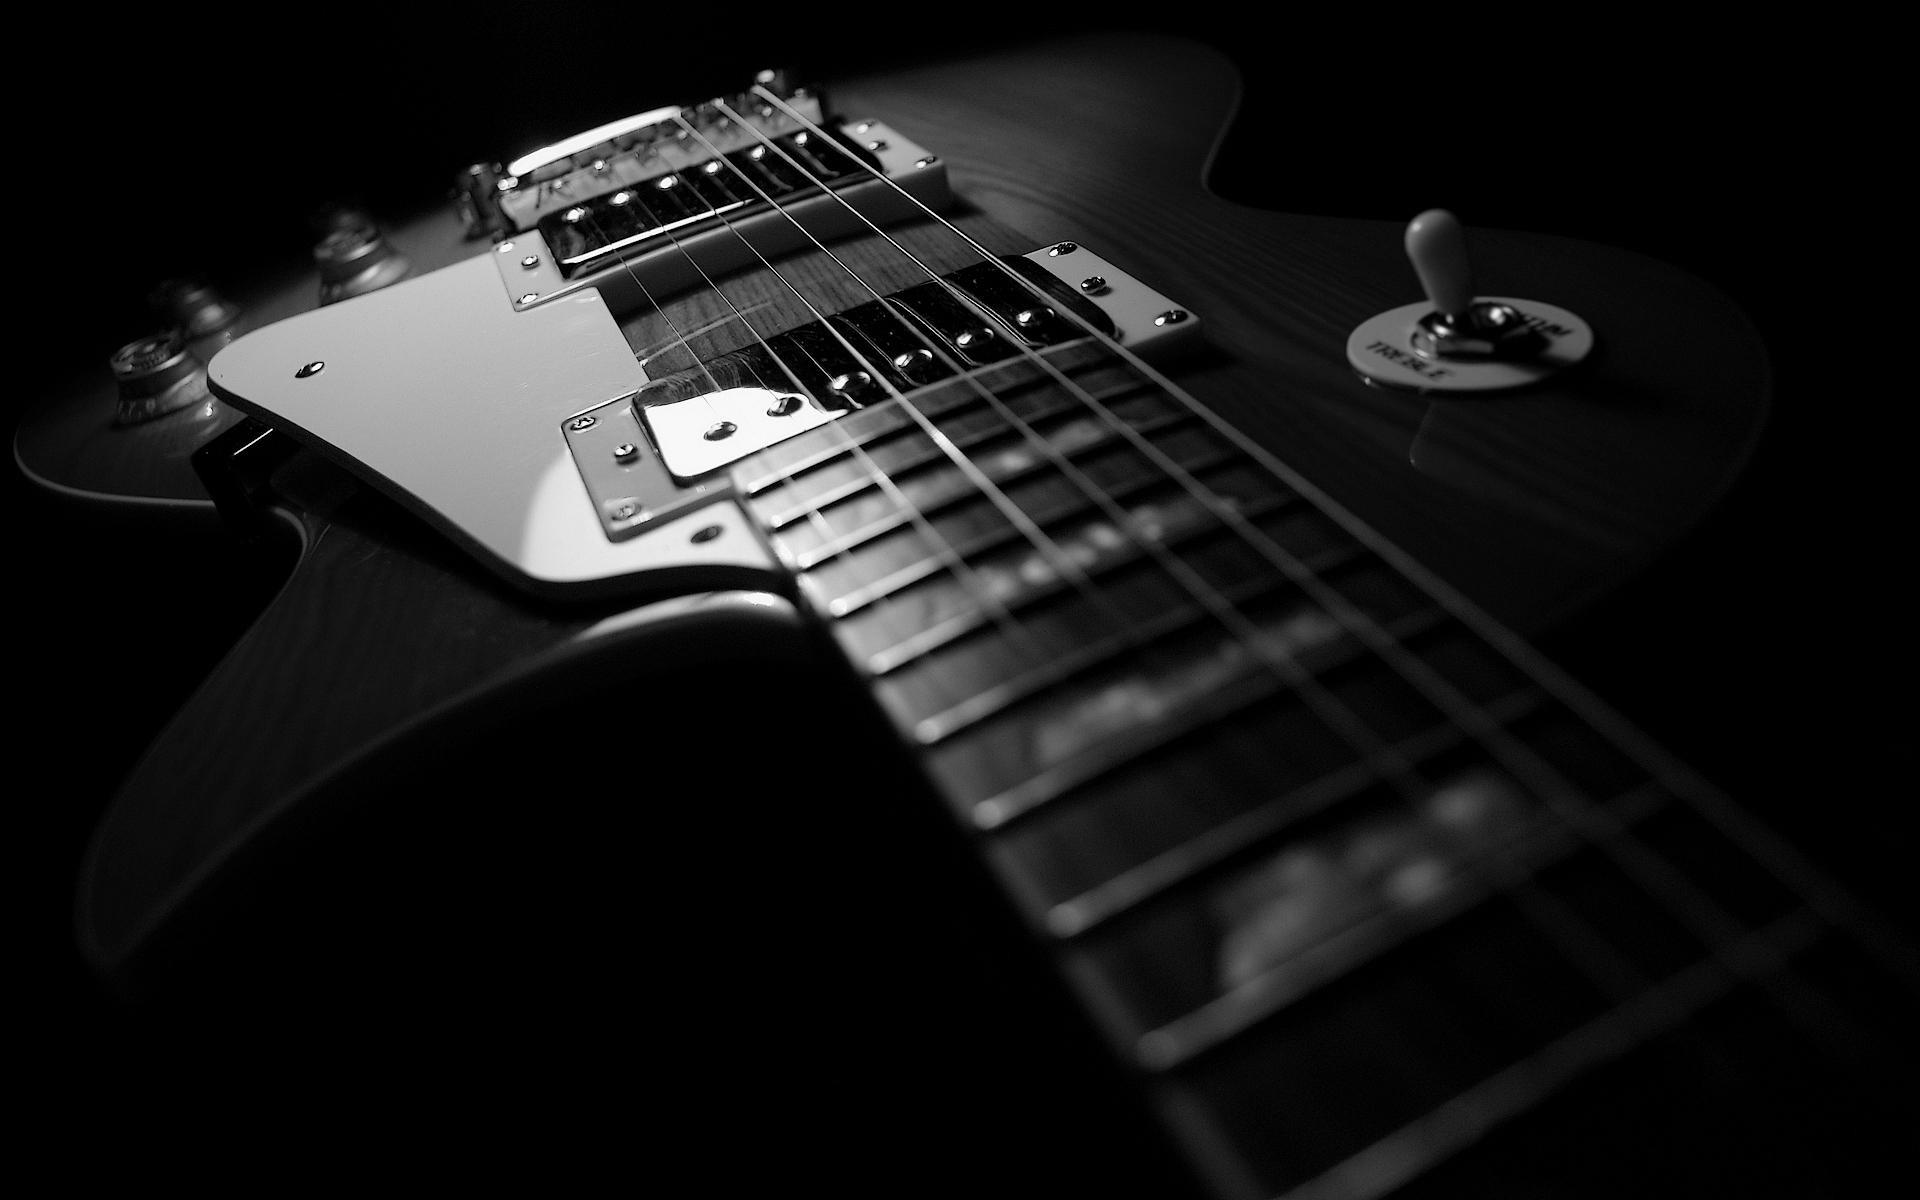 Amazing Electric Guitar Wallpaper 8299